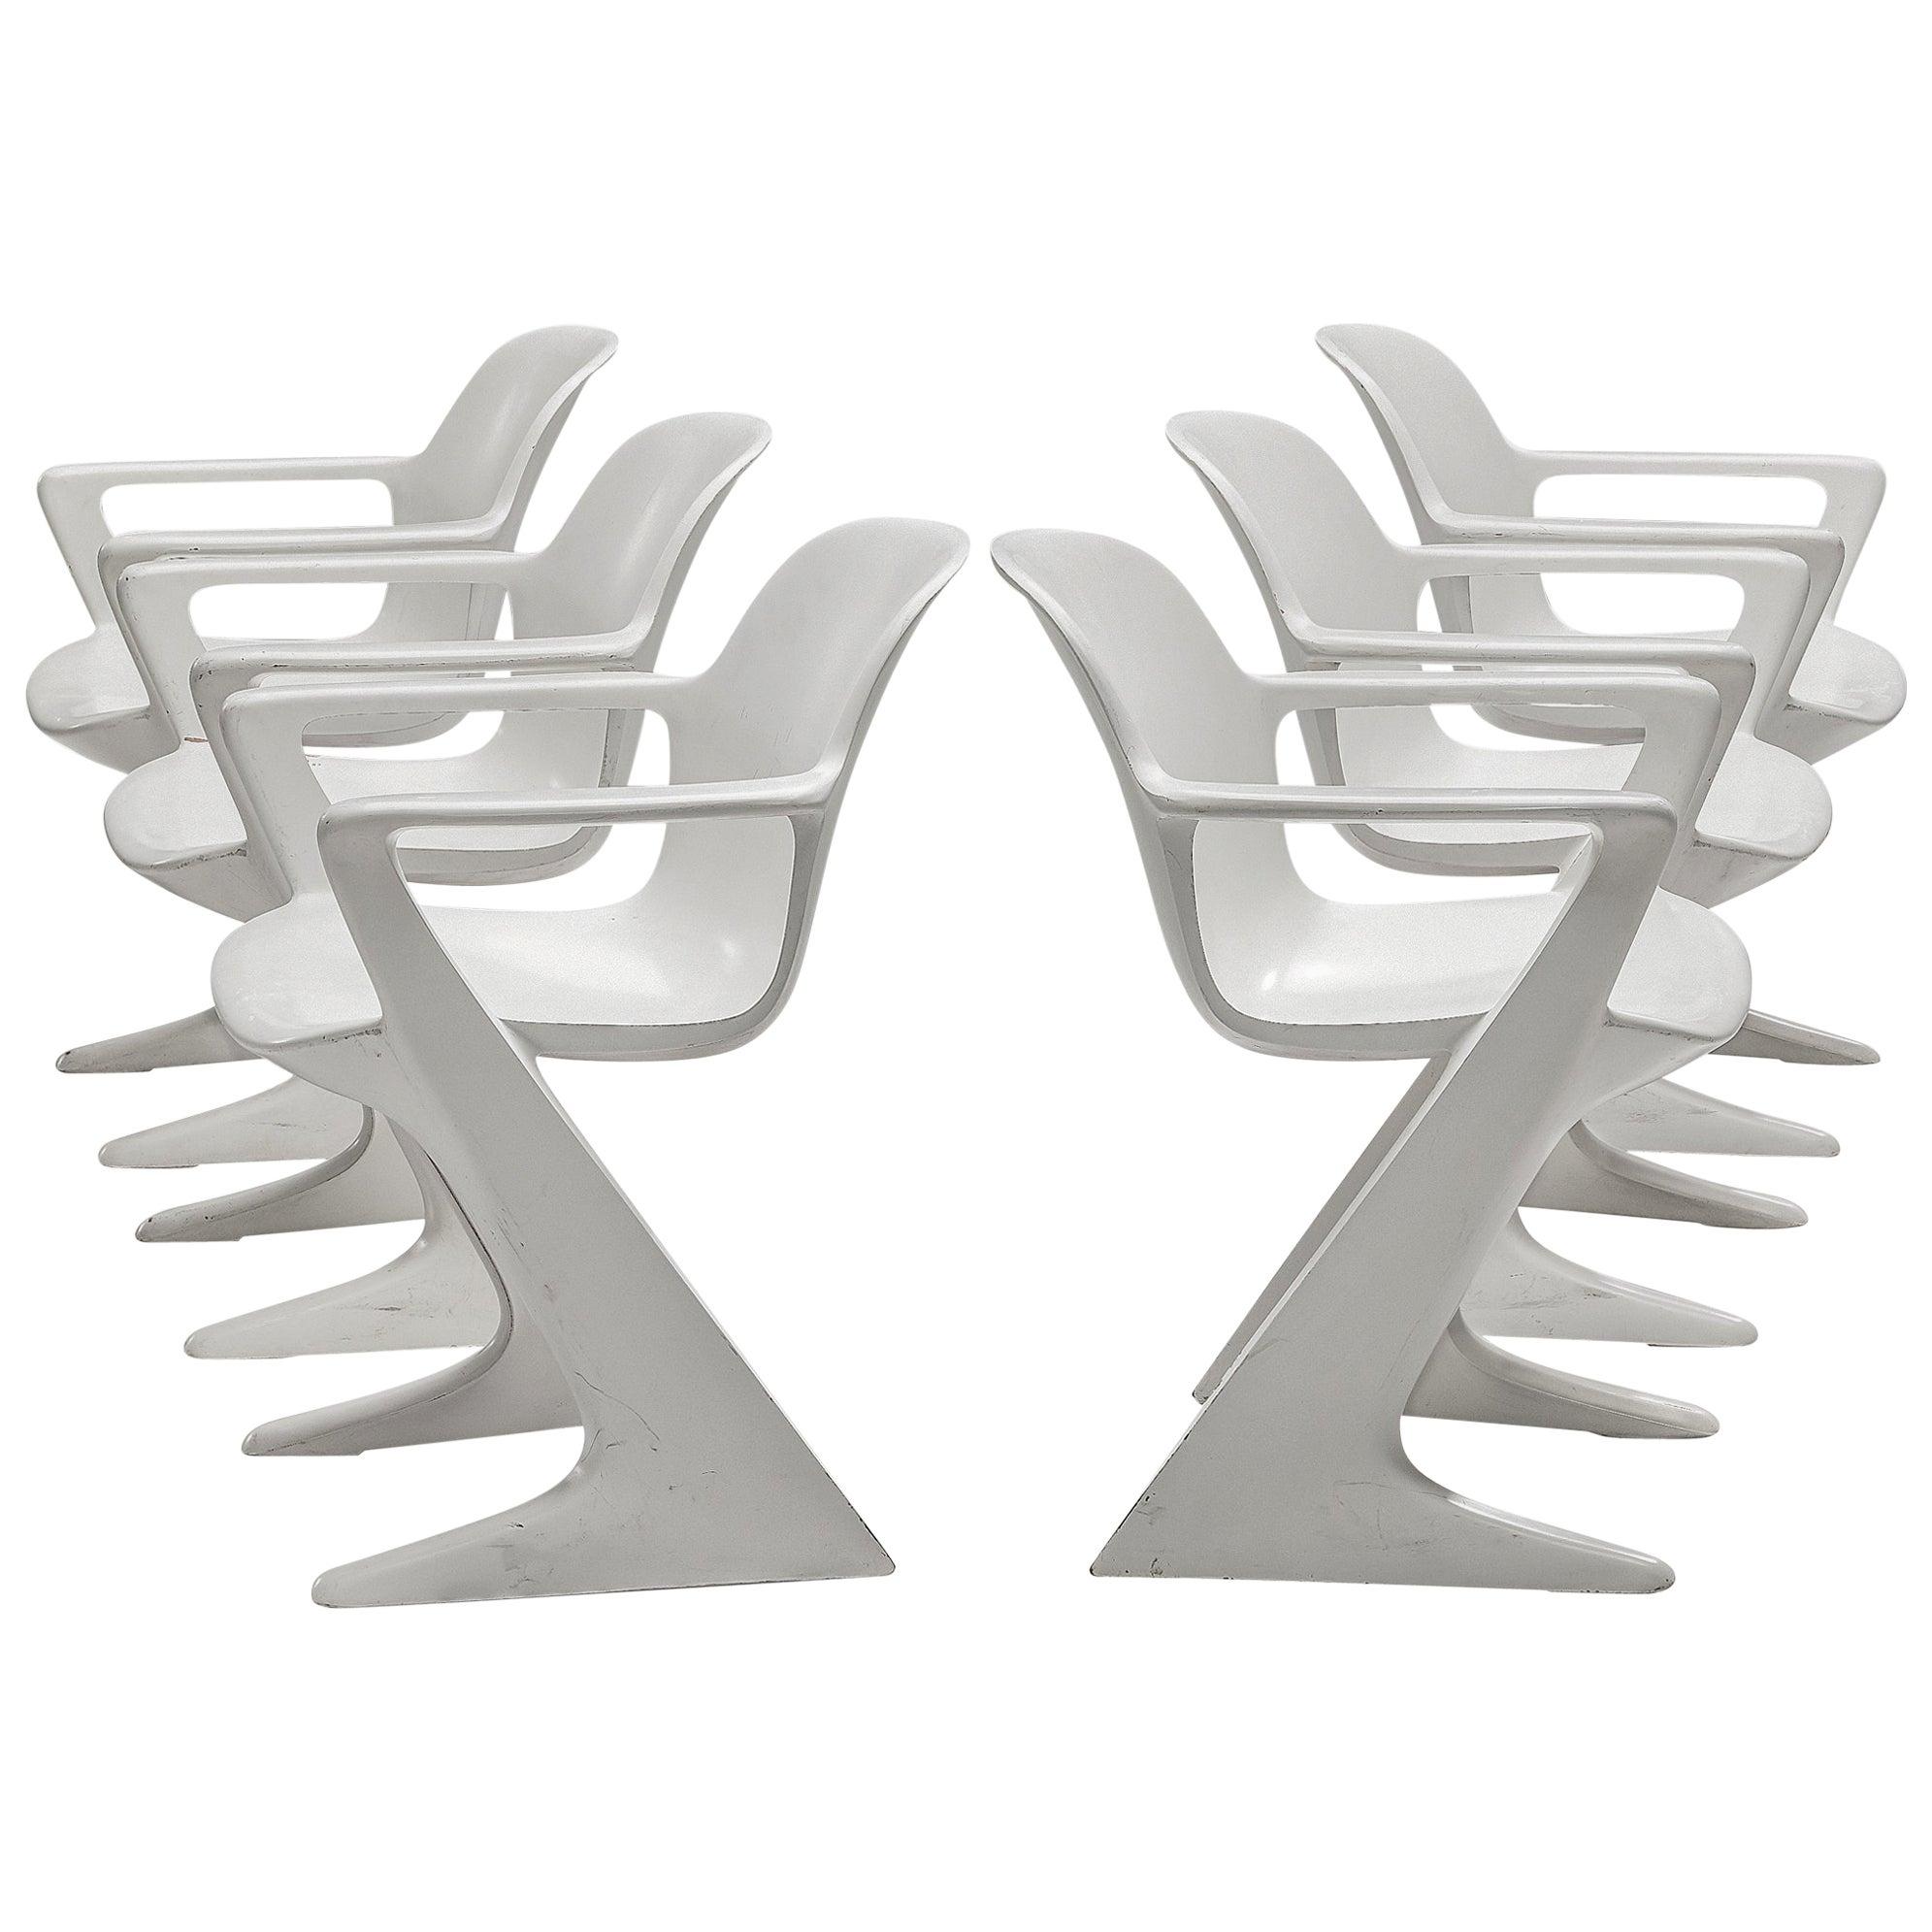 Ernst Moeckl White Kangaroo Chairs